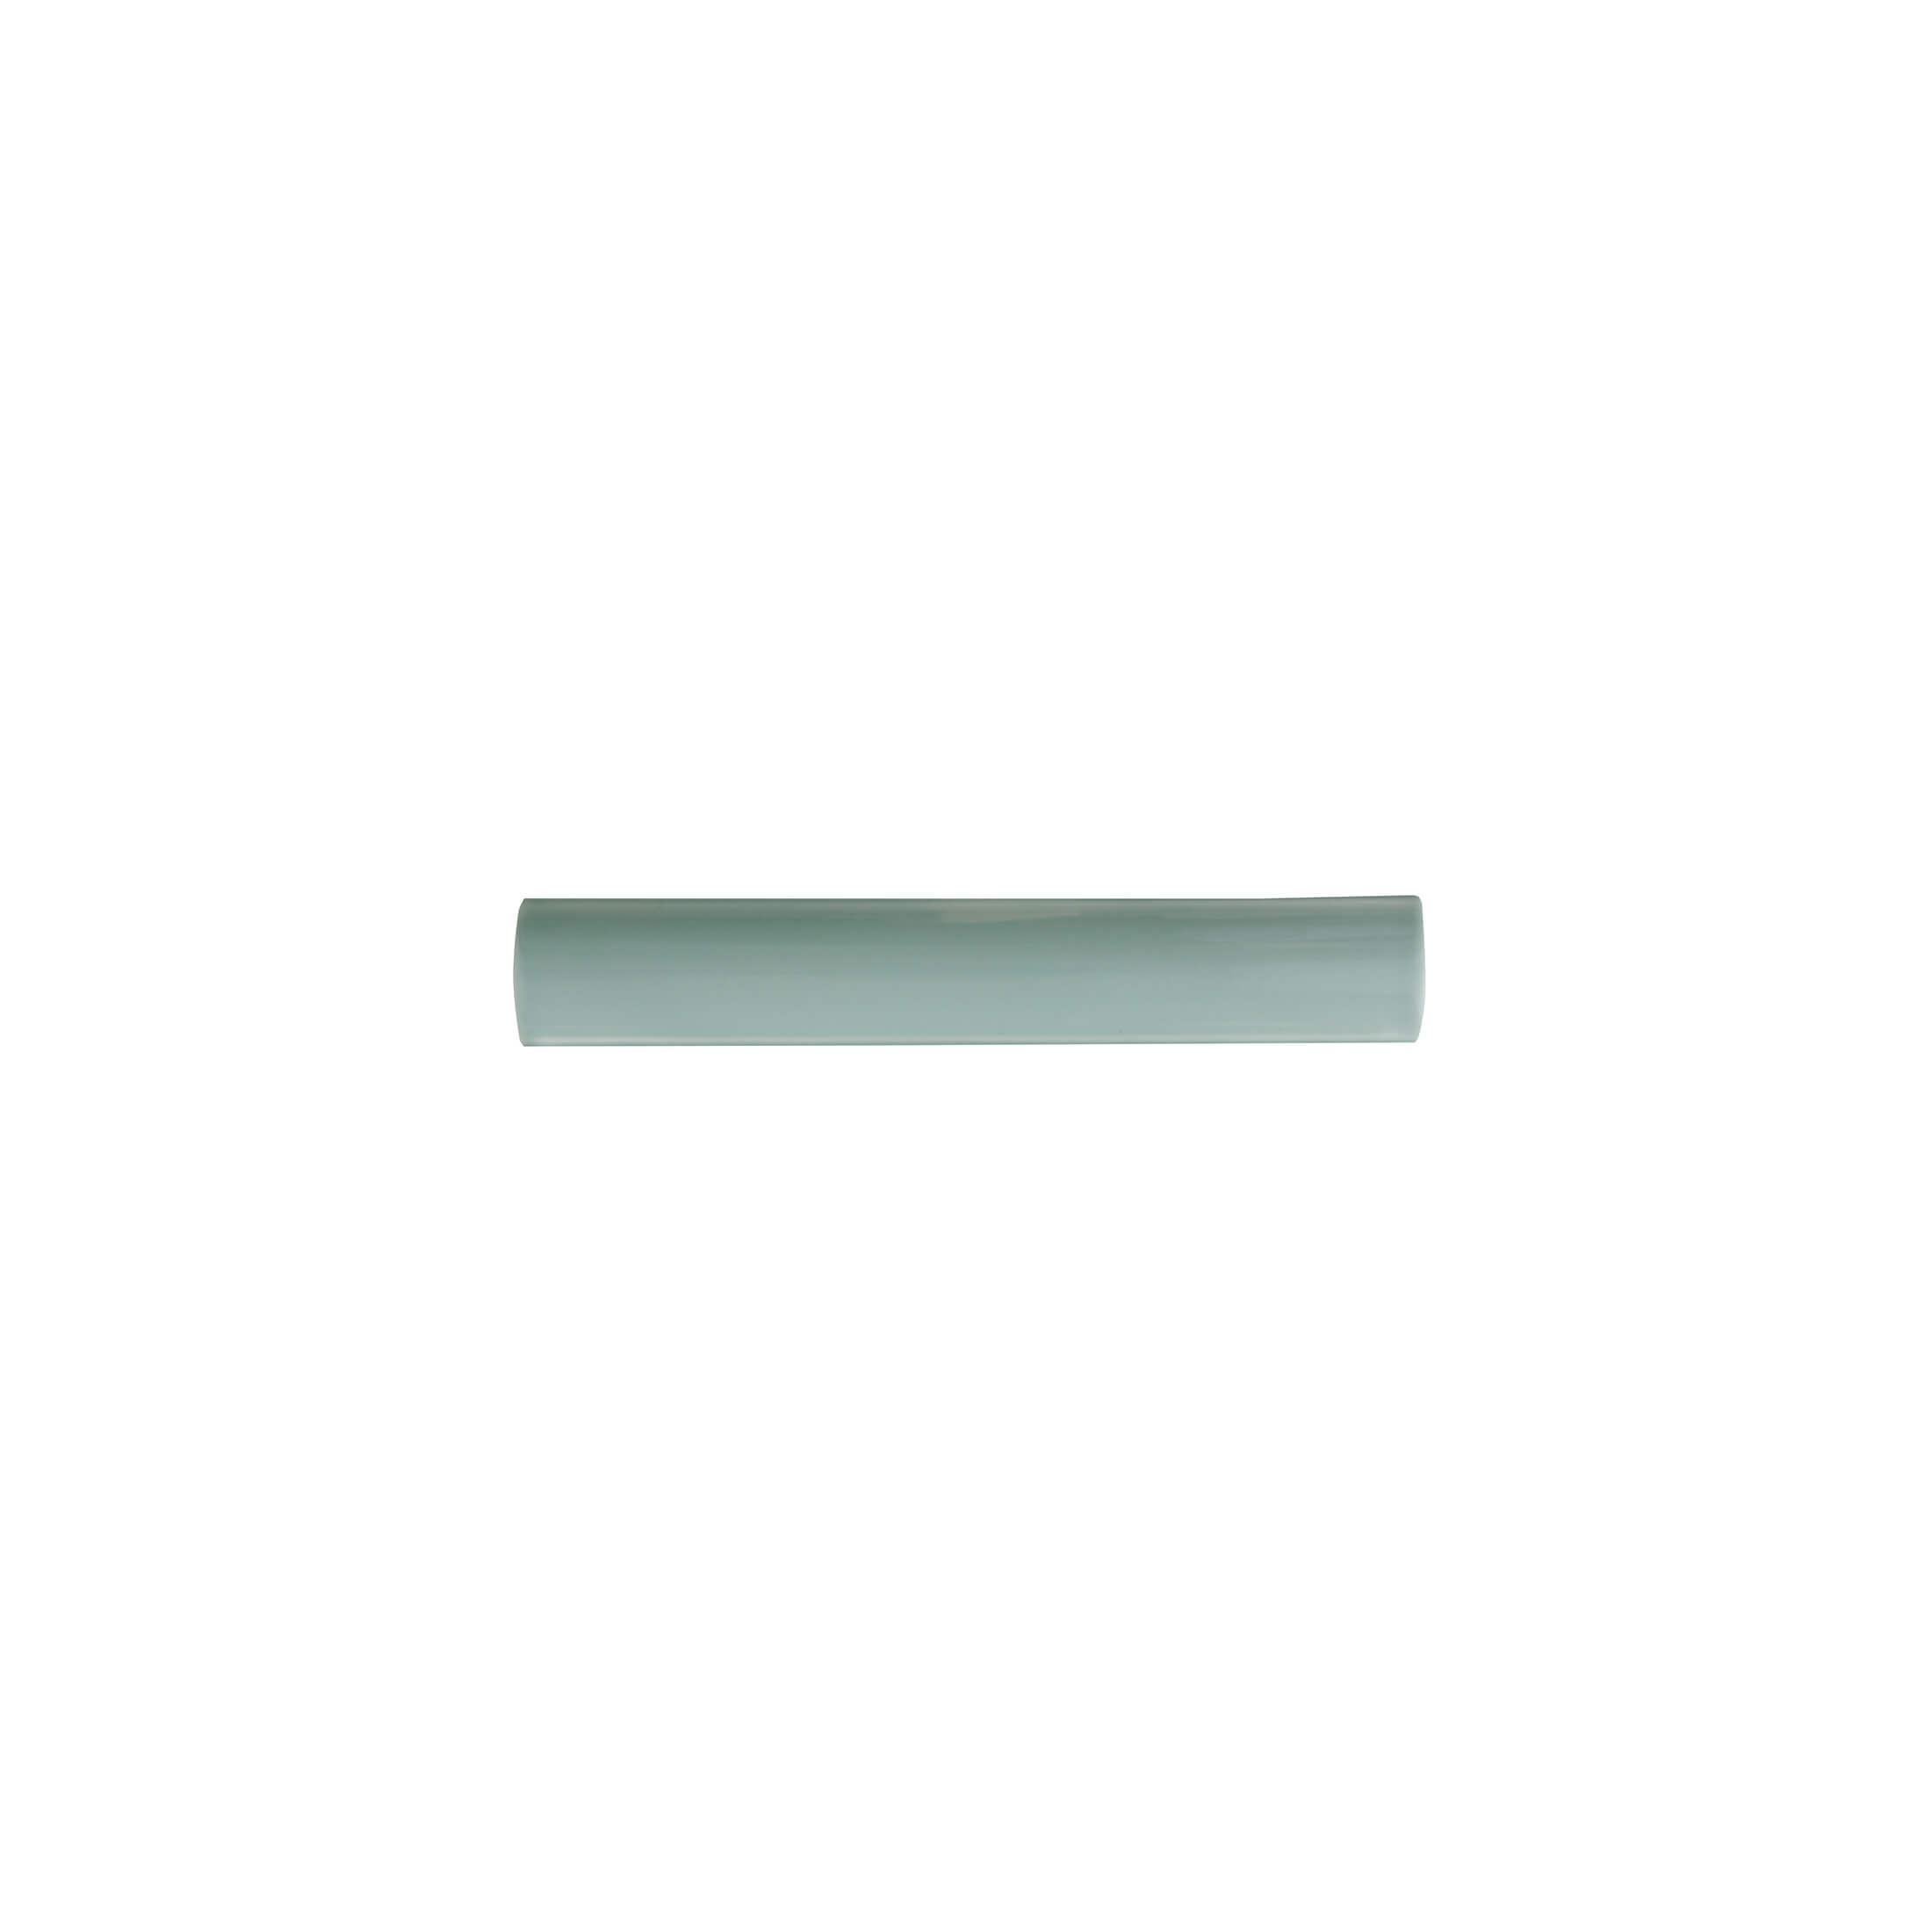 ADNE5621 - CUBRECANTO PB - 2.5 cm X 15 cm